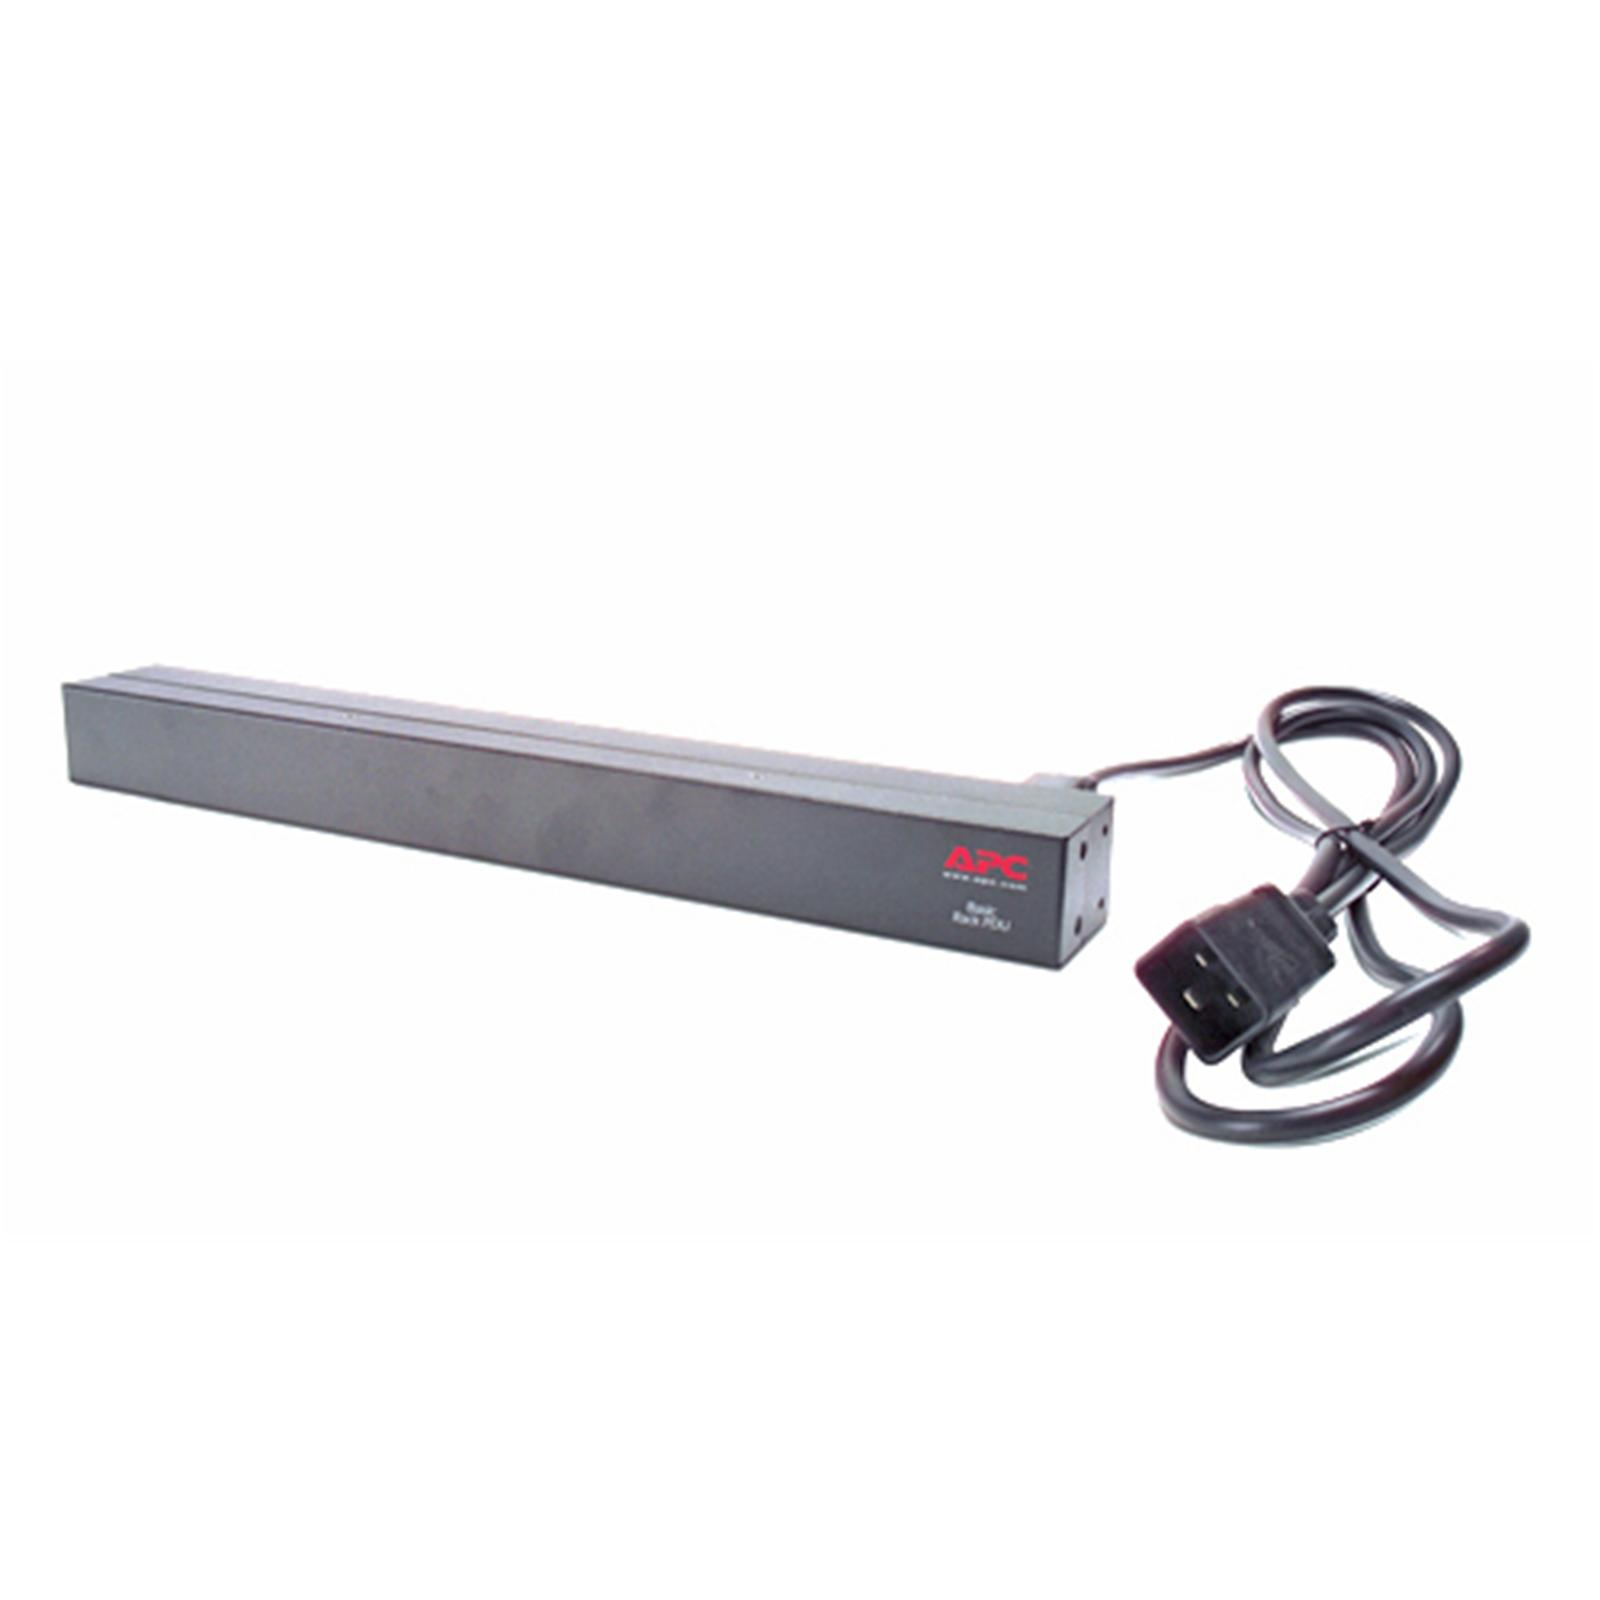 APC Rack PDU, Basic, 1U, 16A, 230V, AP9565